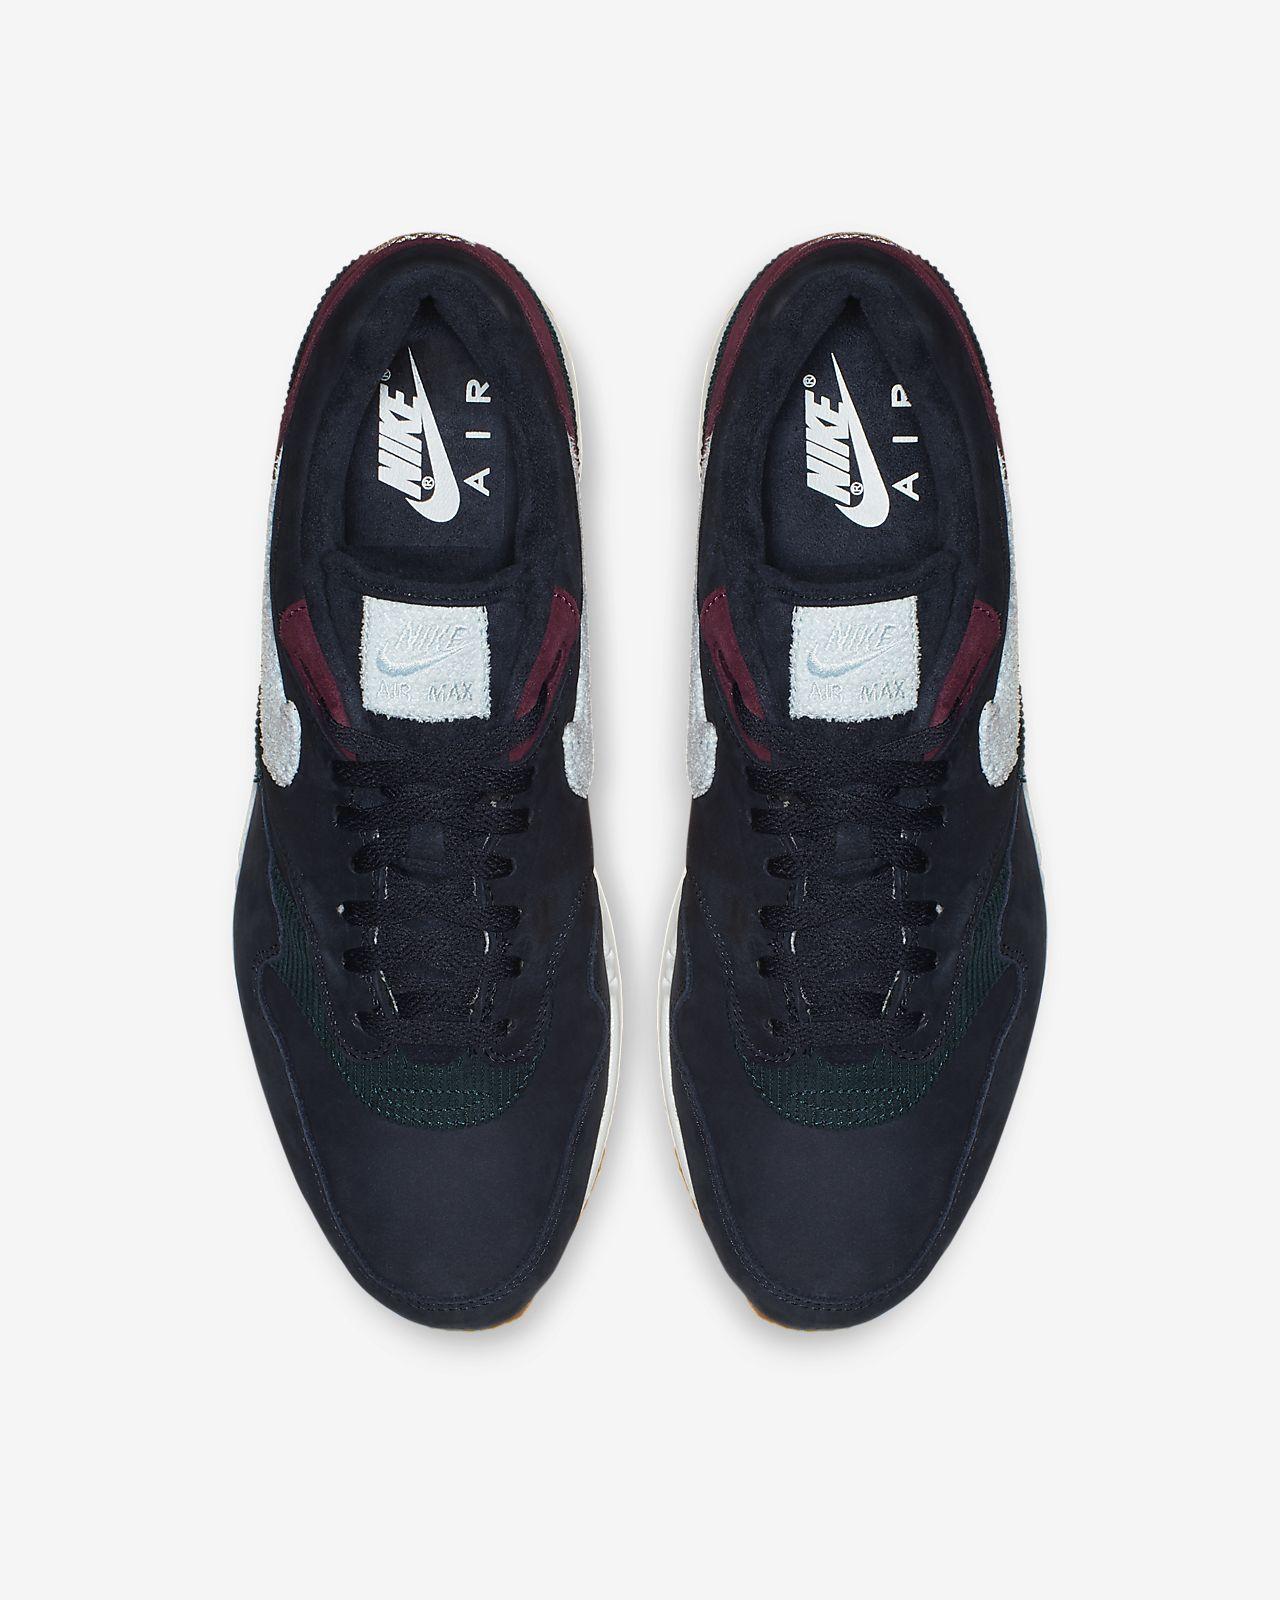 Nike Air Max 1 Crepe Sole (Dark Obsidian Cobalt)